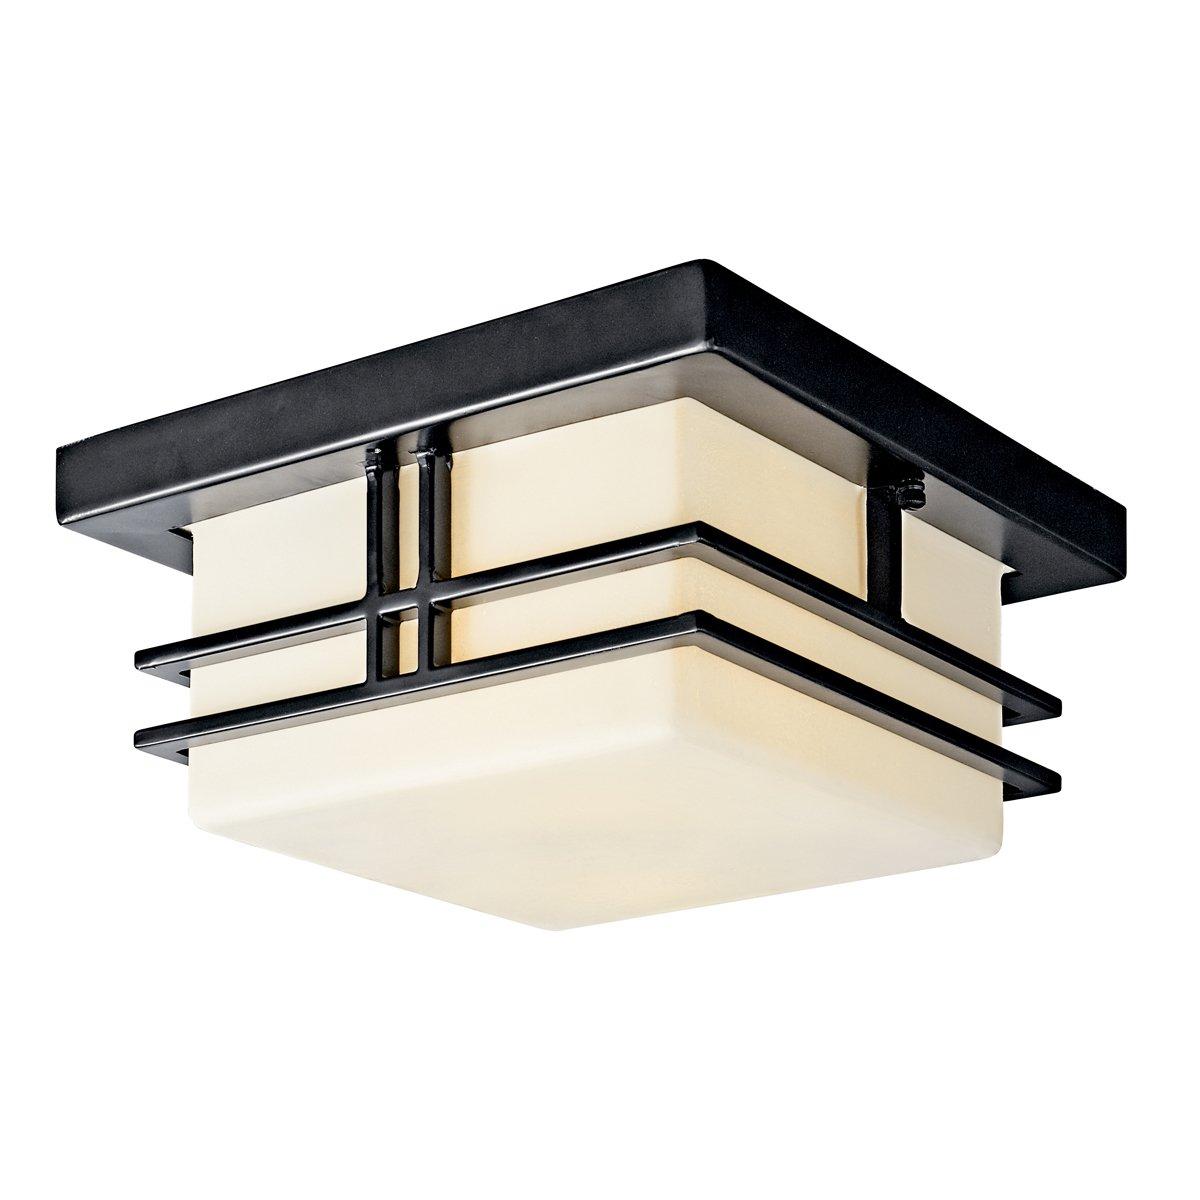 Kichler Lighting 49206BKFL Tremillo 2LT CFL Outdoor Flush Mount, Black with Satin-Etched Cased Opal Glass by Kichler B003F1J50M